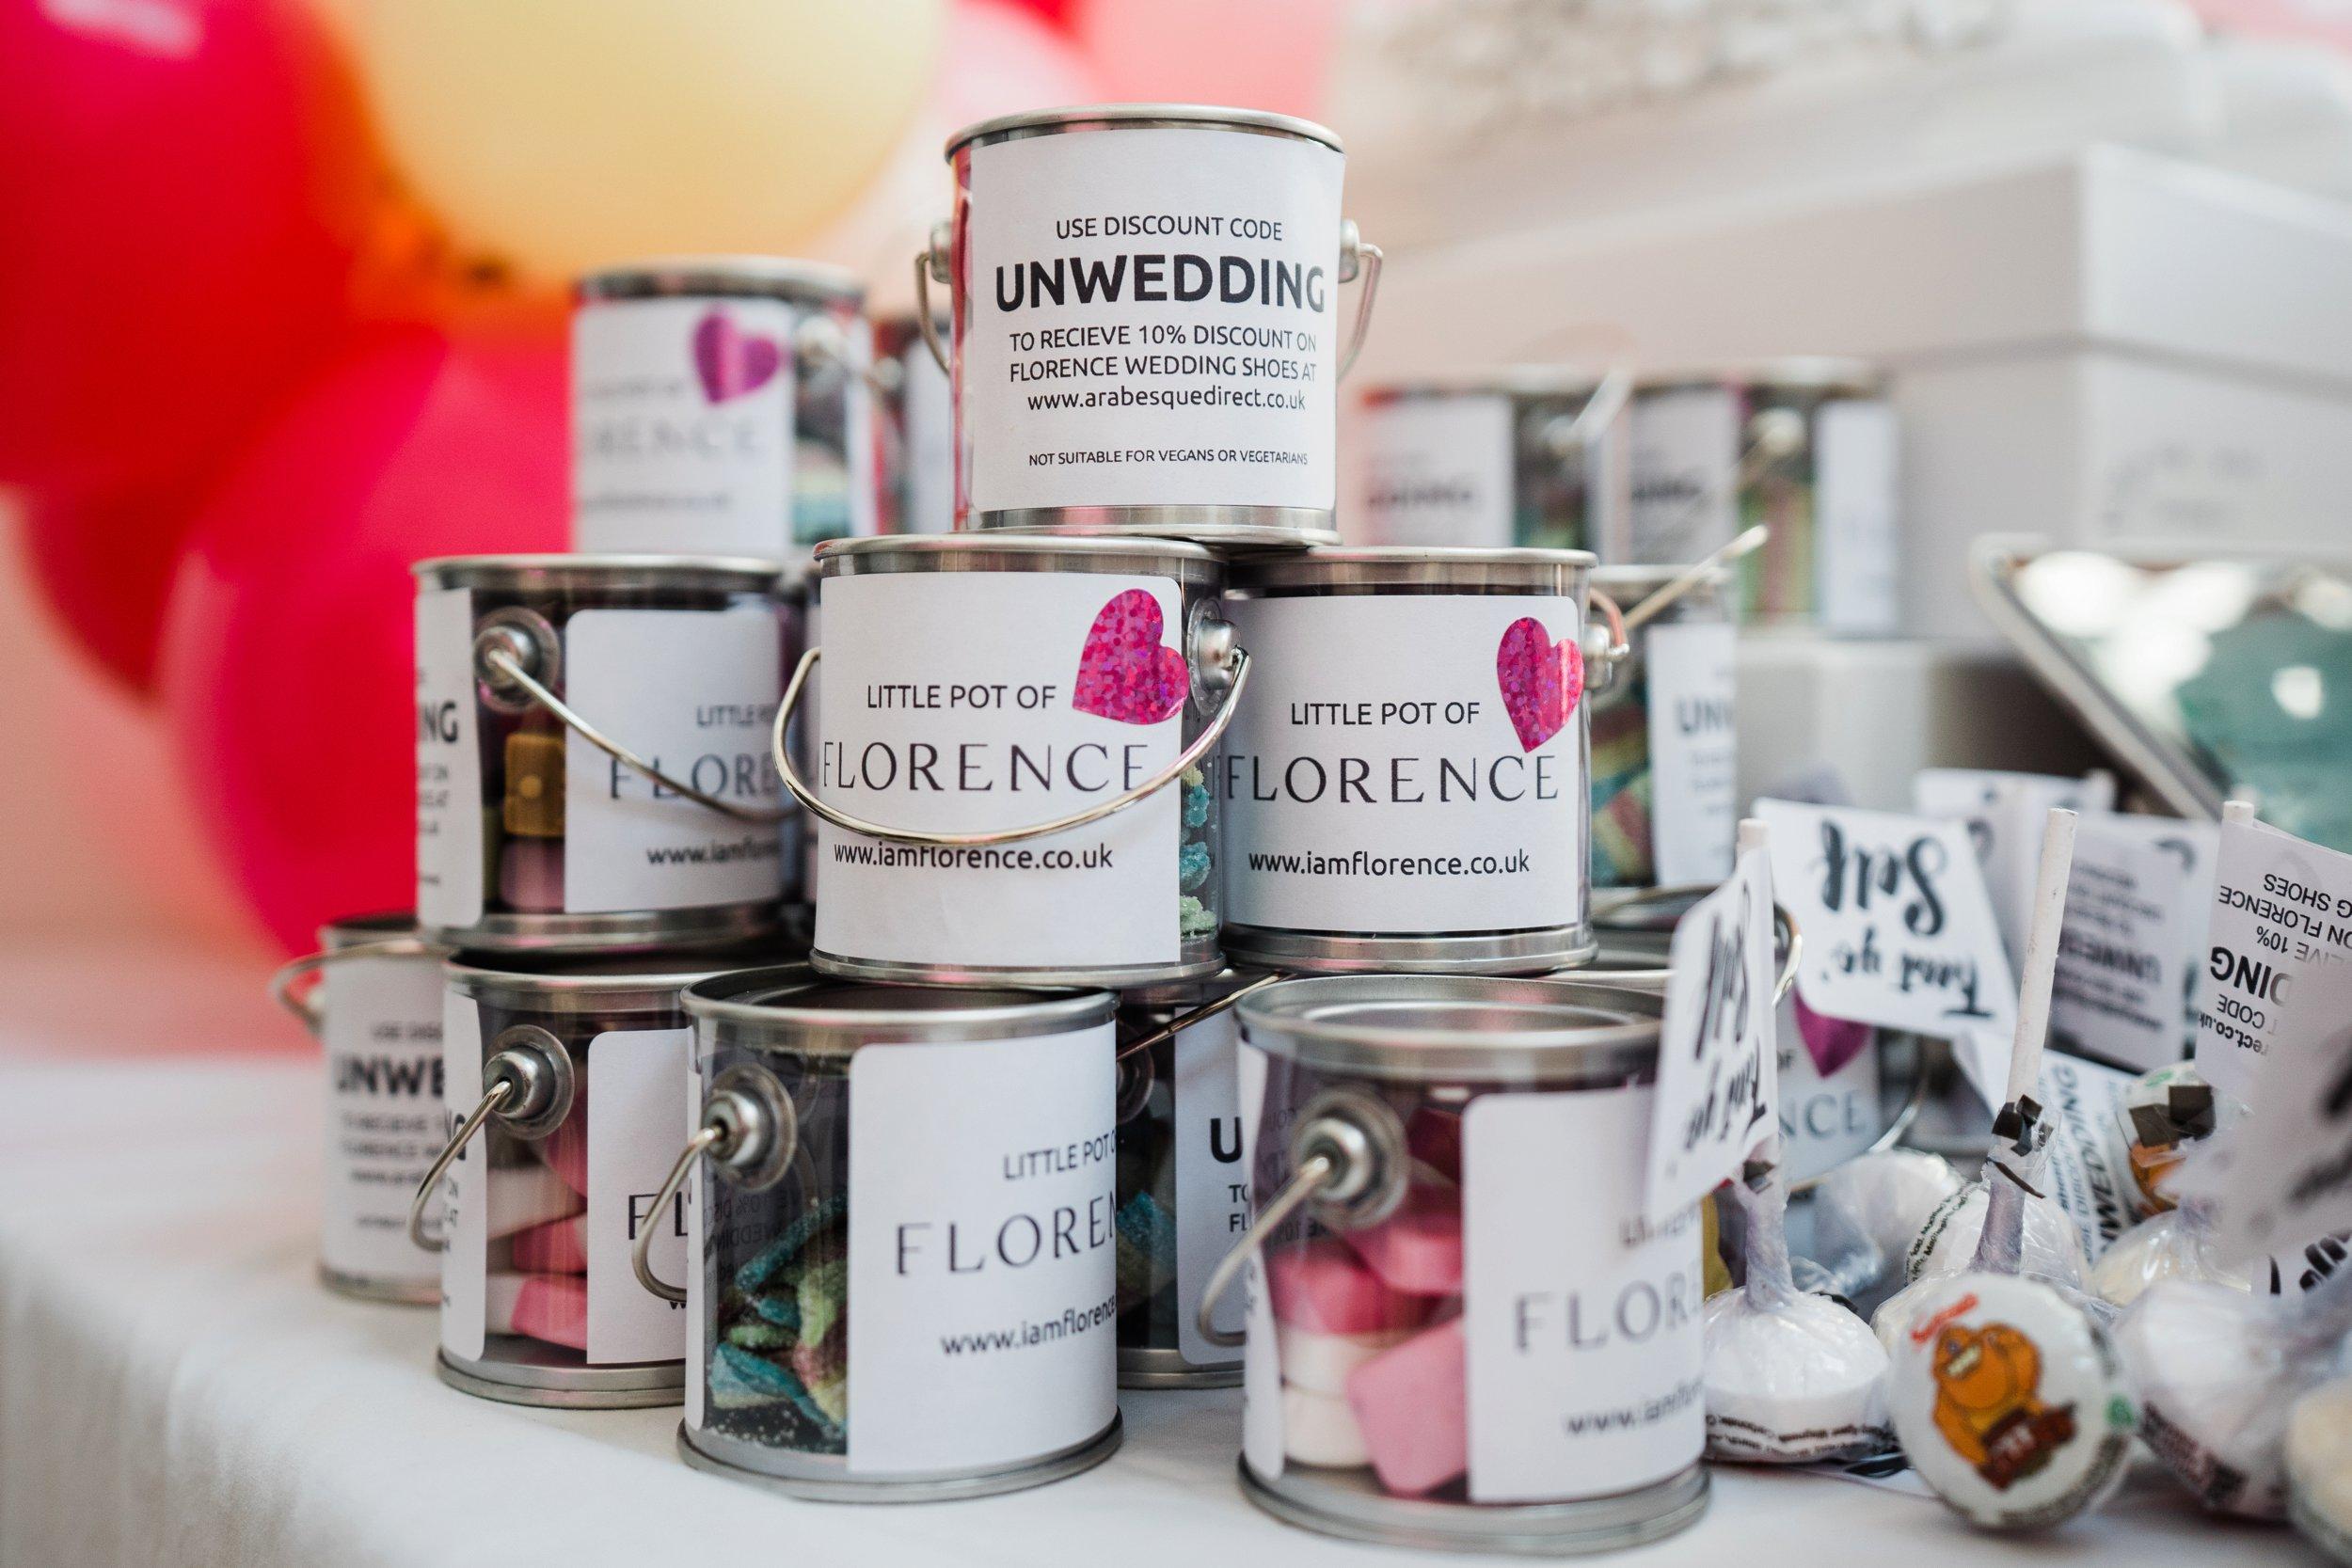 The UN-WEDDING SHOW 2019 cool bride style modern wedding fair Birmingham Fazeley Studios 00012.jpg